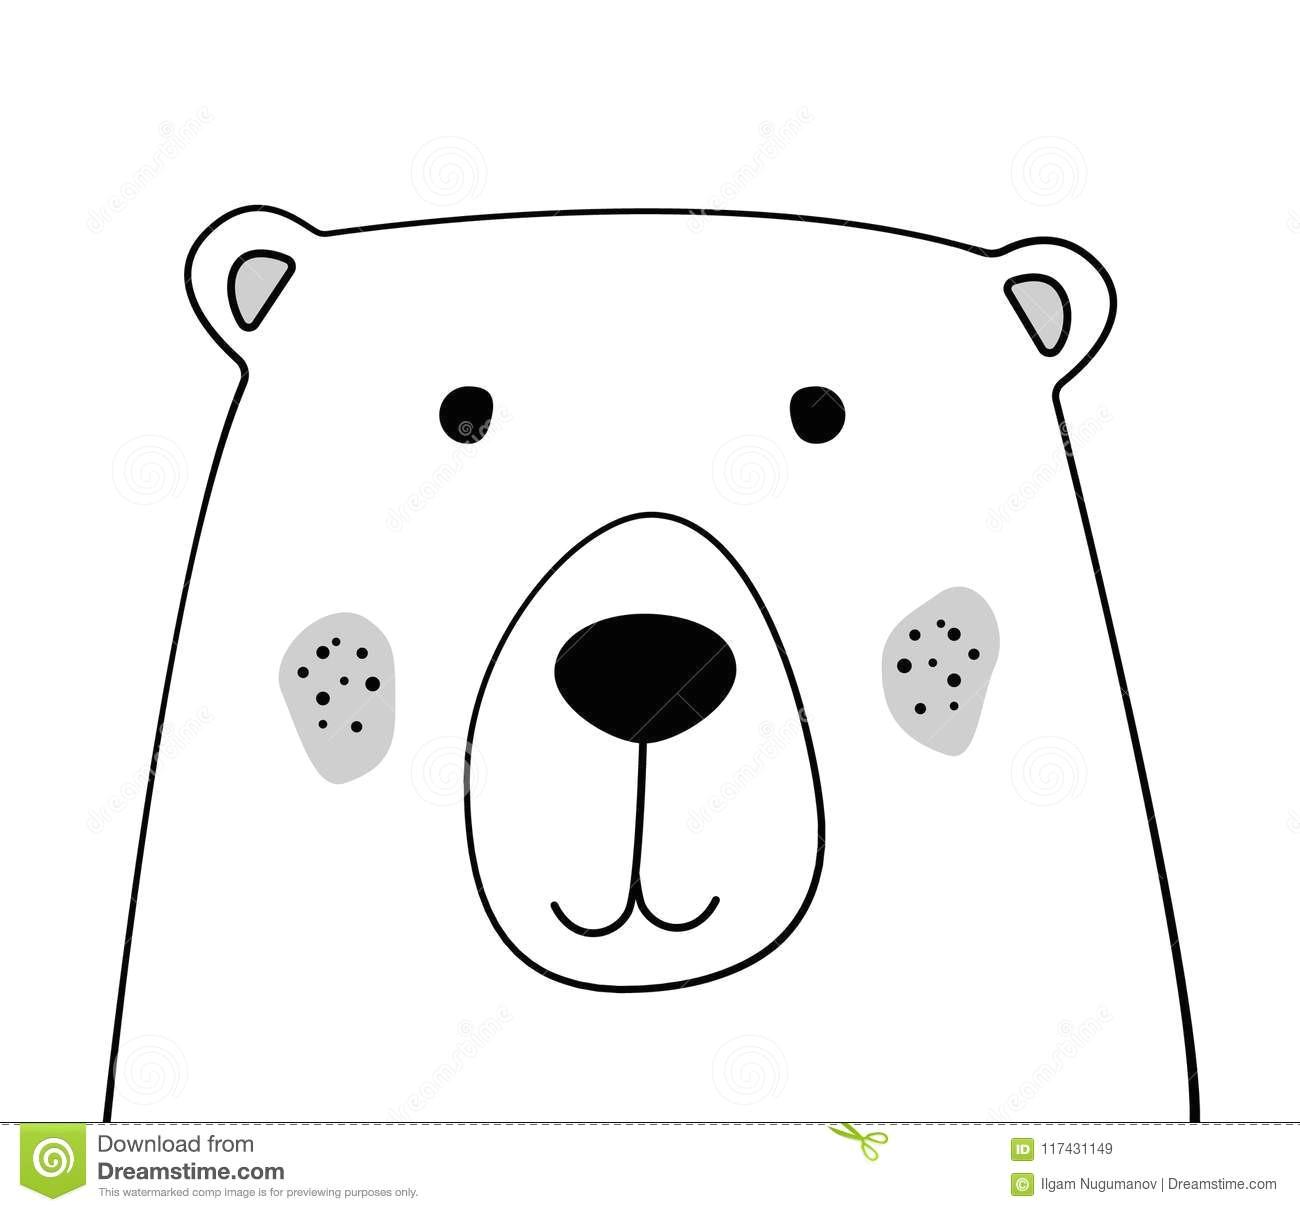 doodle sketch bear illustration cartoon teddy bear wild animal postcard poster